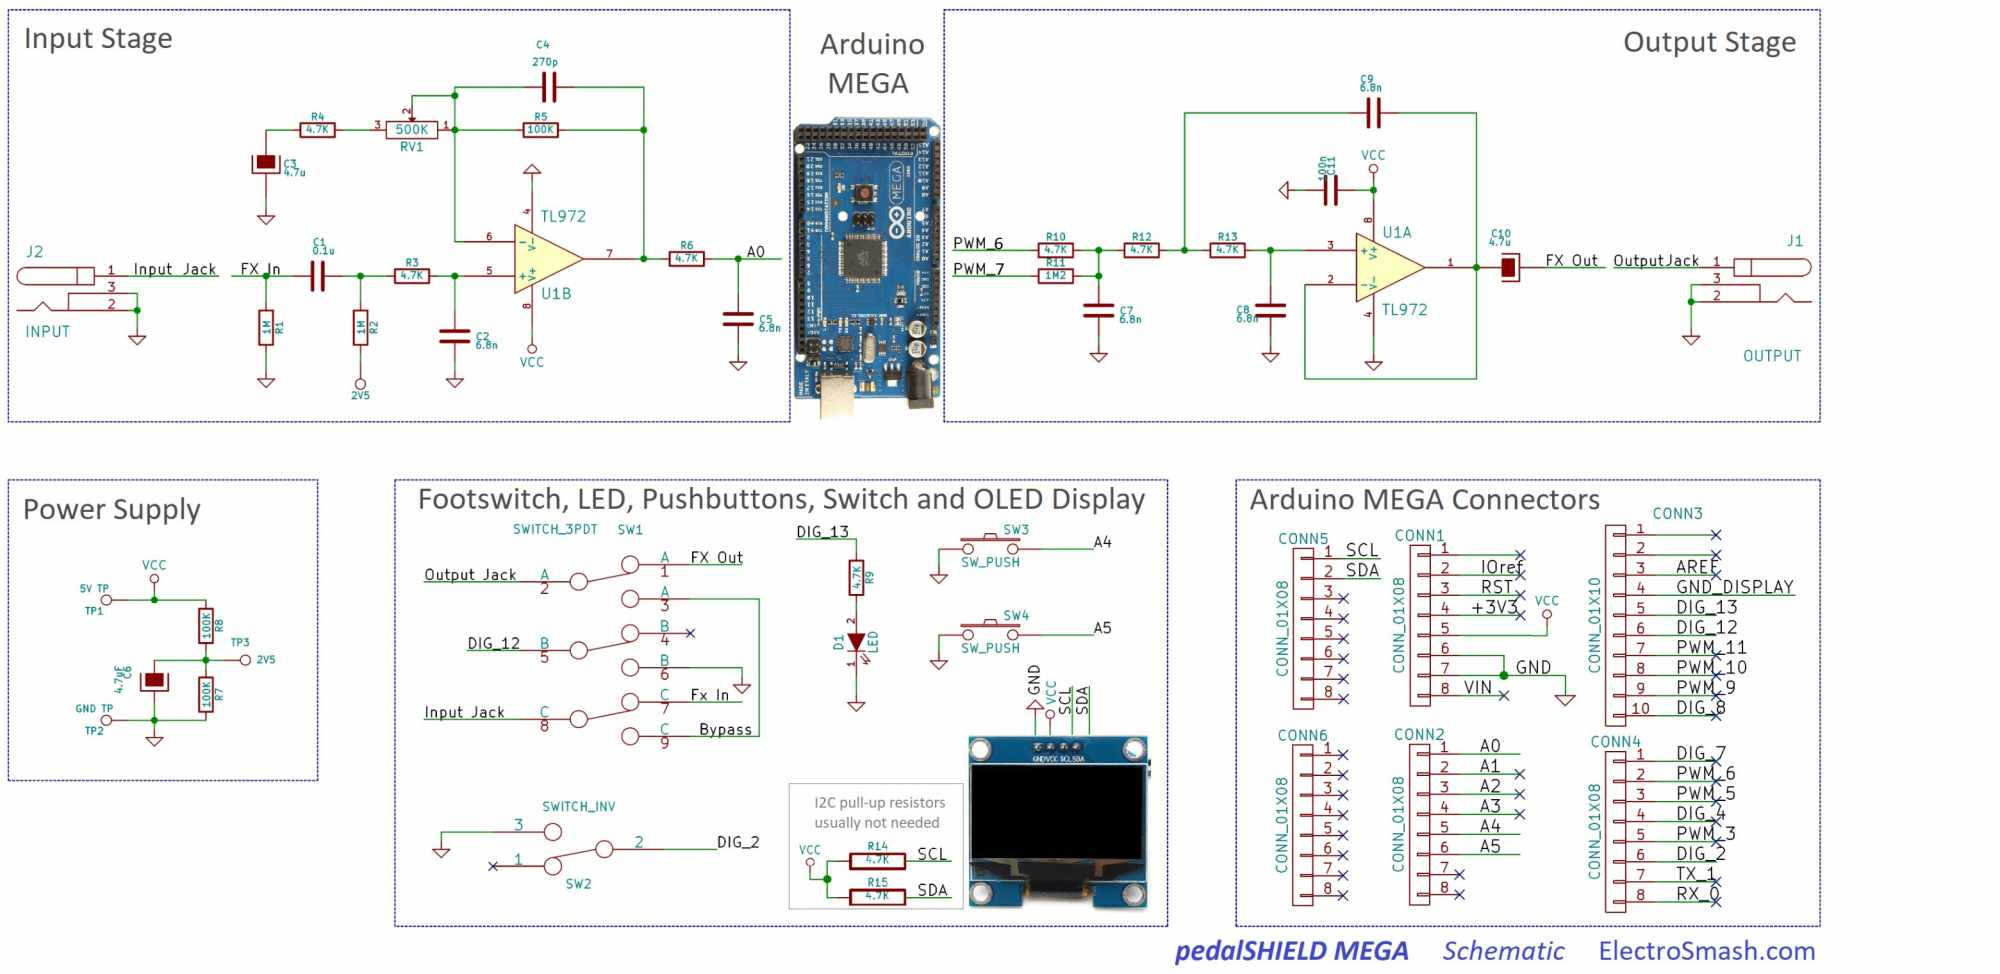 pedalshield-mega-schematic_2018-03-07.jpg